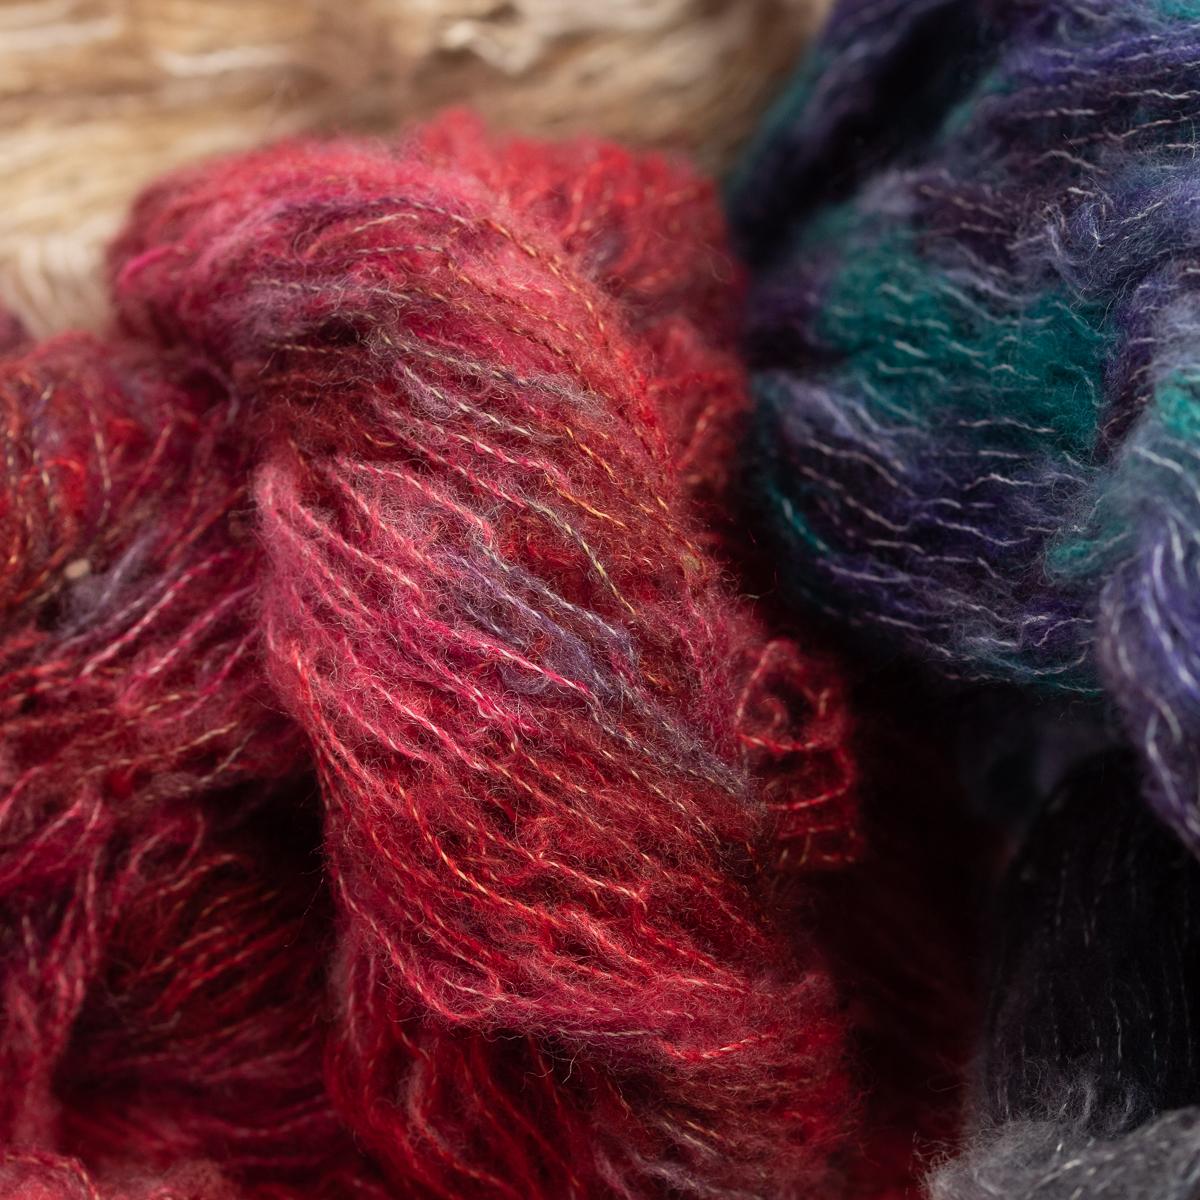 thumbnail 26 - 3pk-Lion-Brand-Imagine-Acrylic-Blend-Yarn-Super-Bulky-6-Knitting-Crochet-Soft